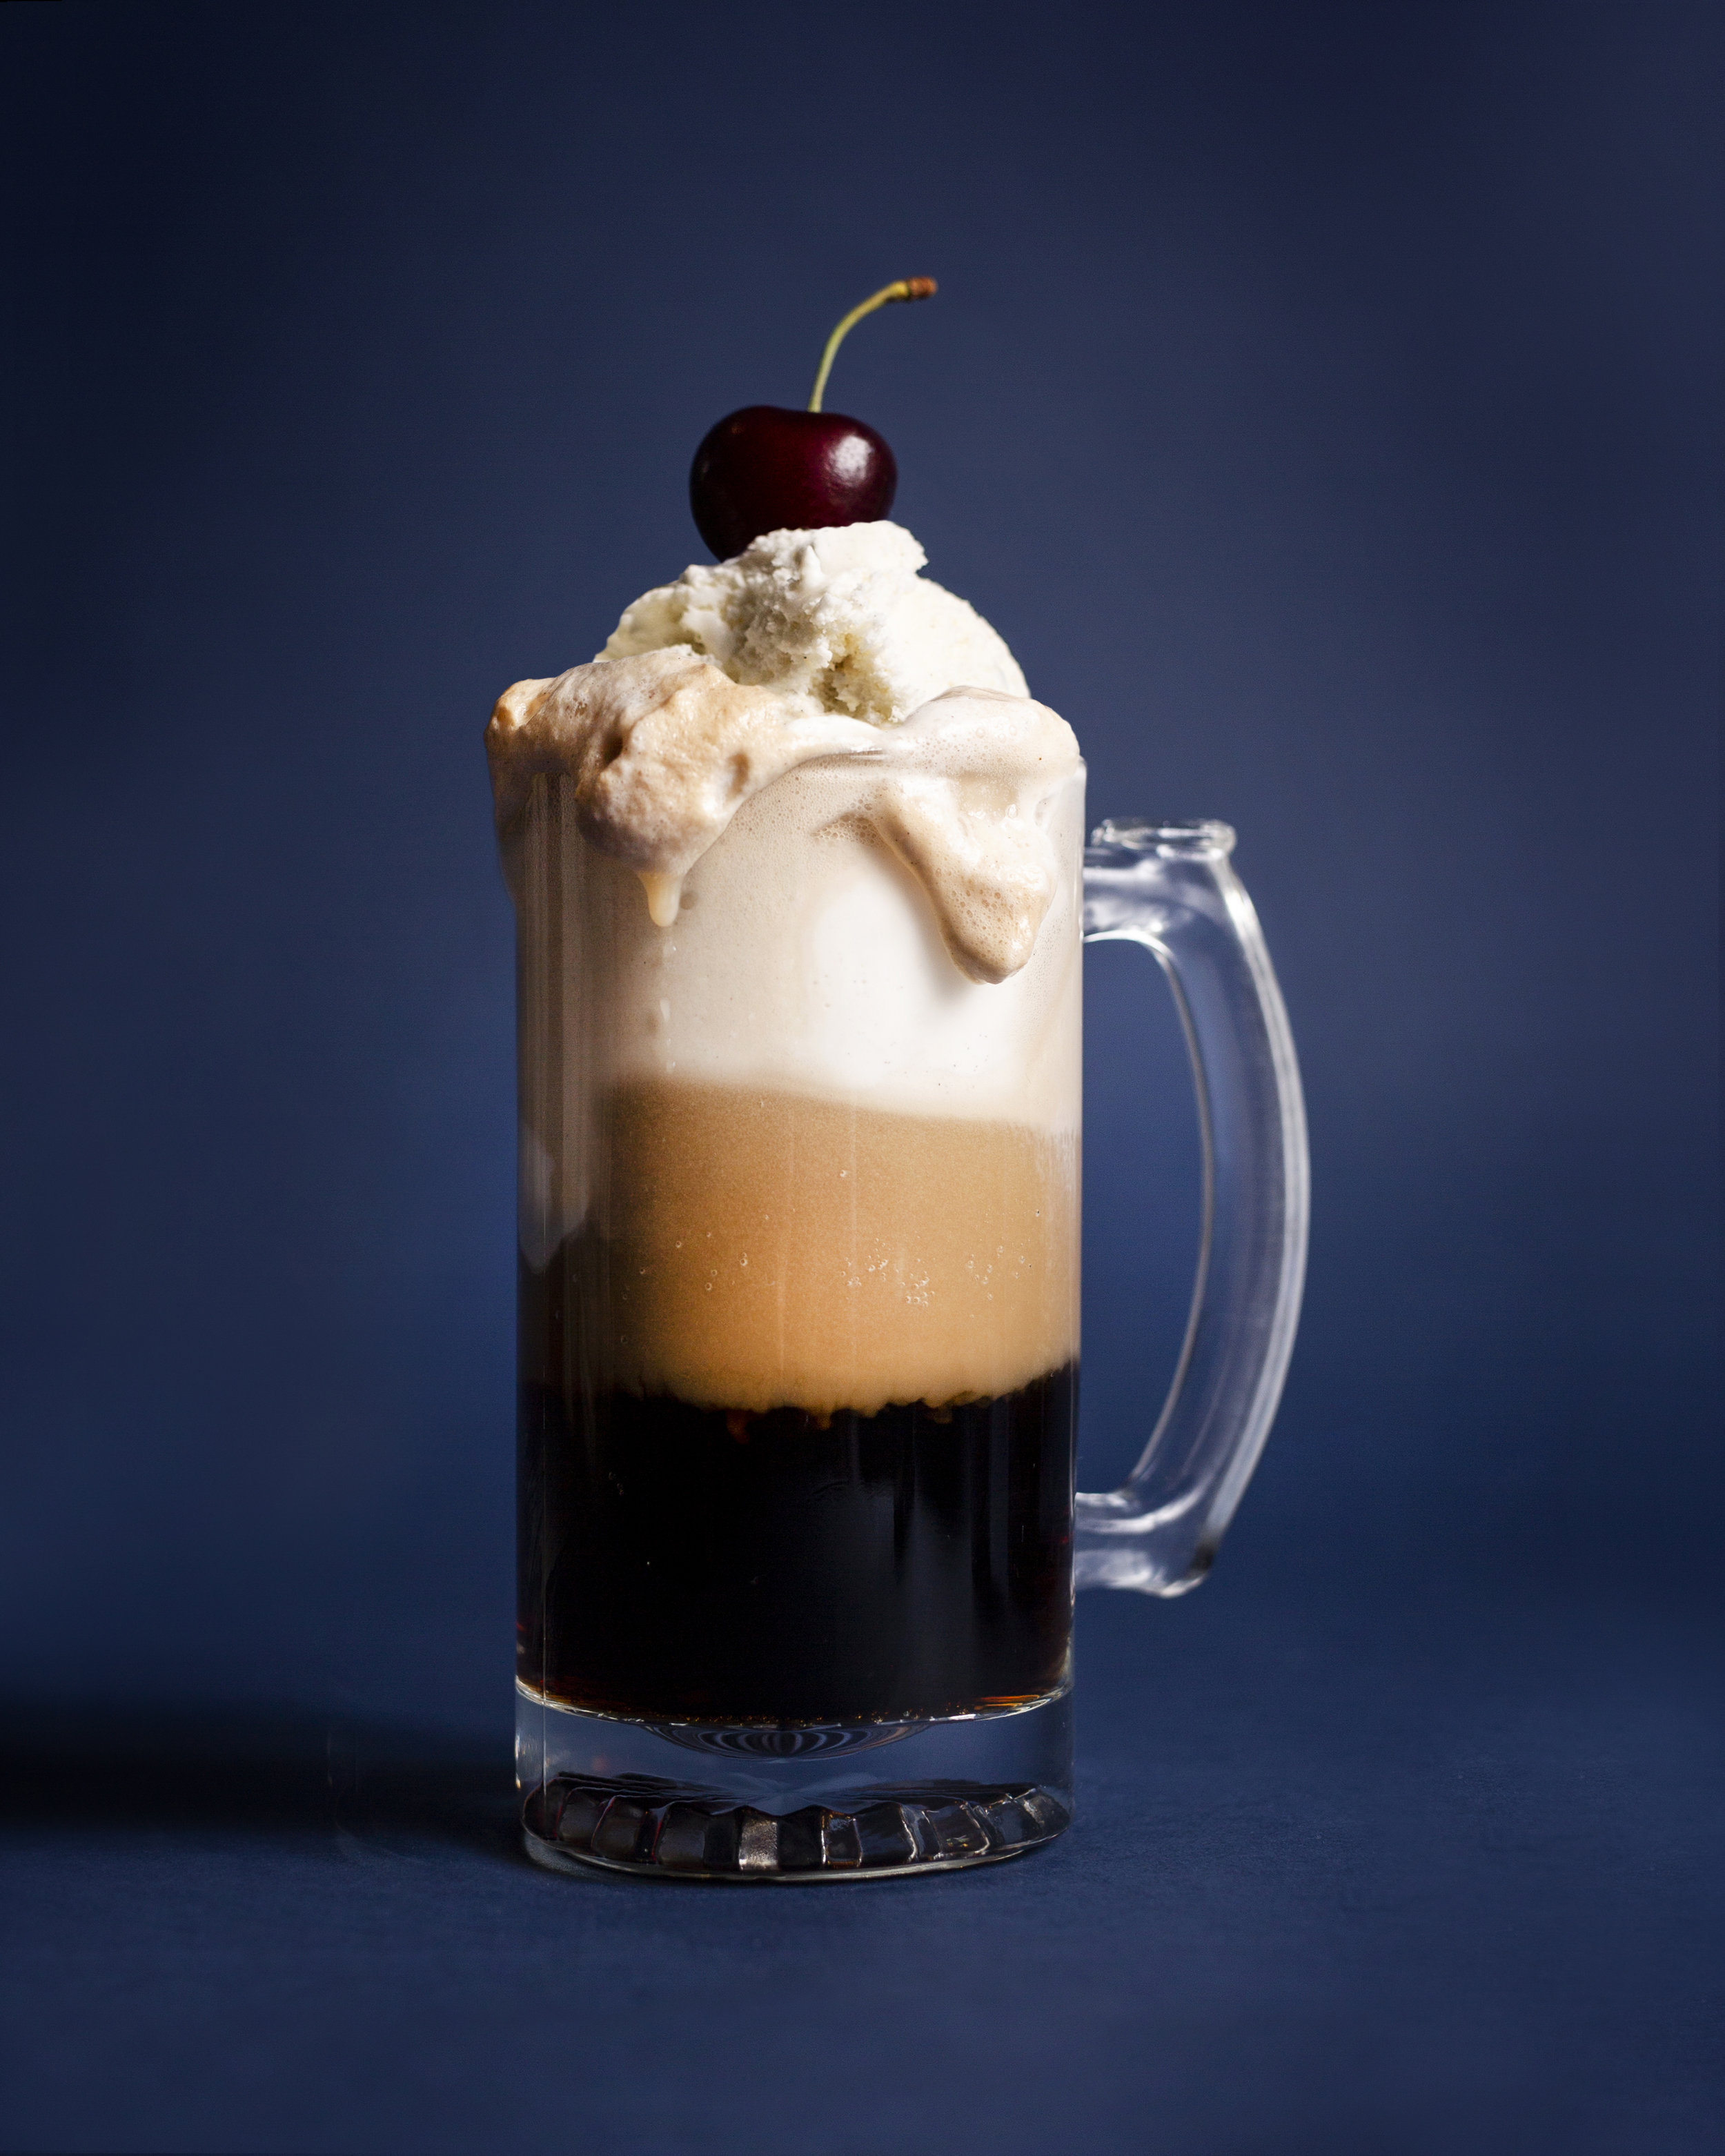 milkshake5x4.jpg